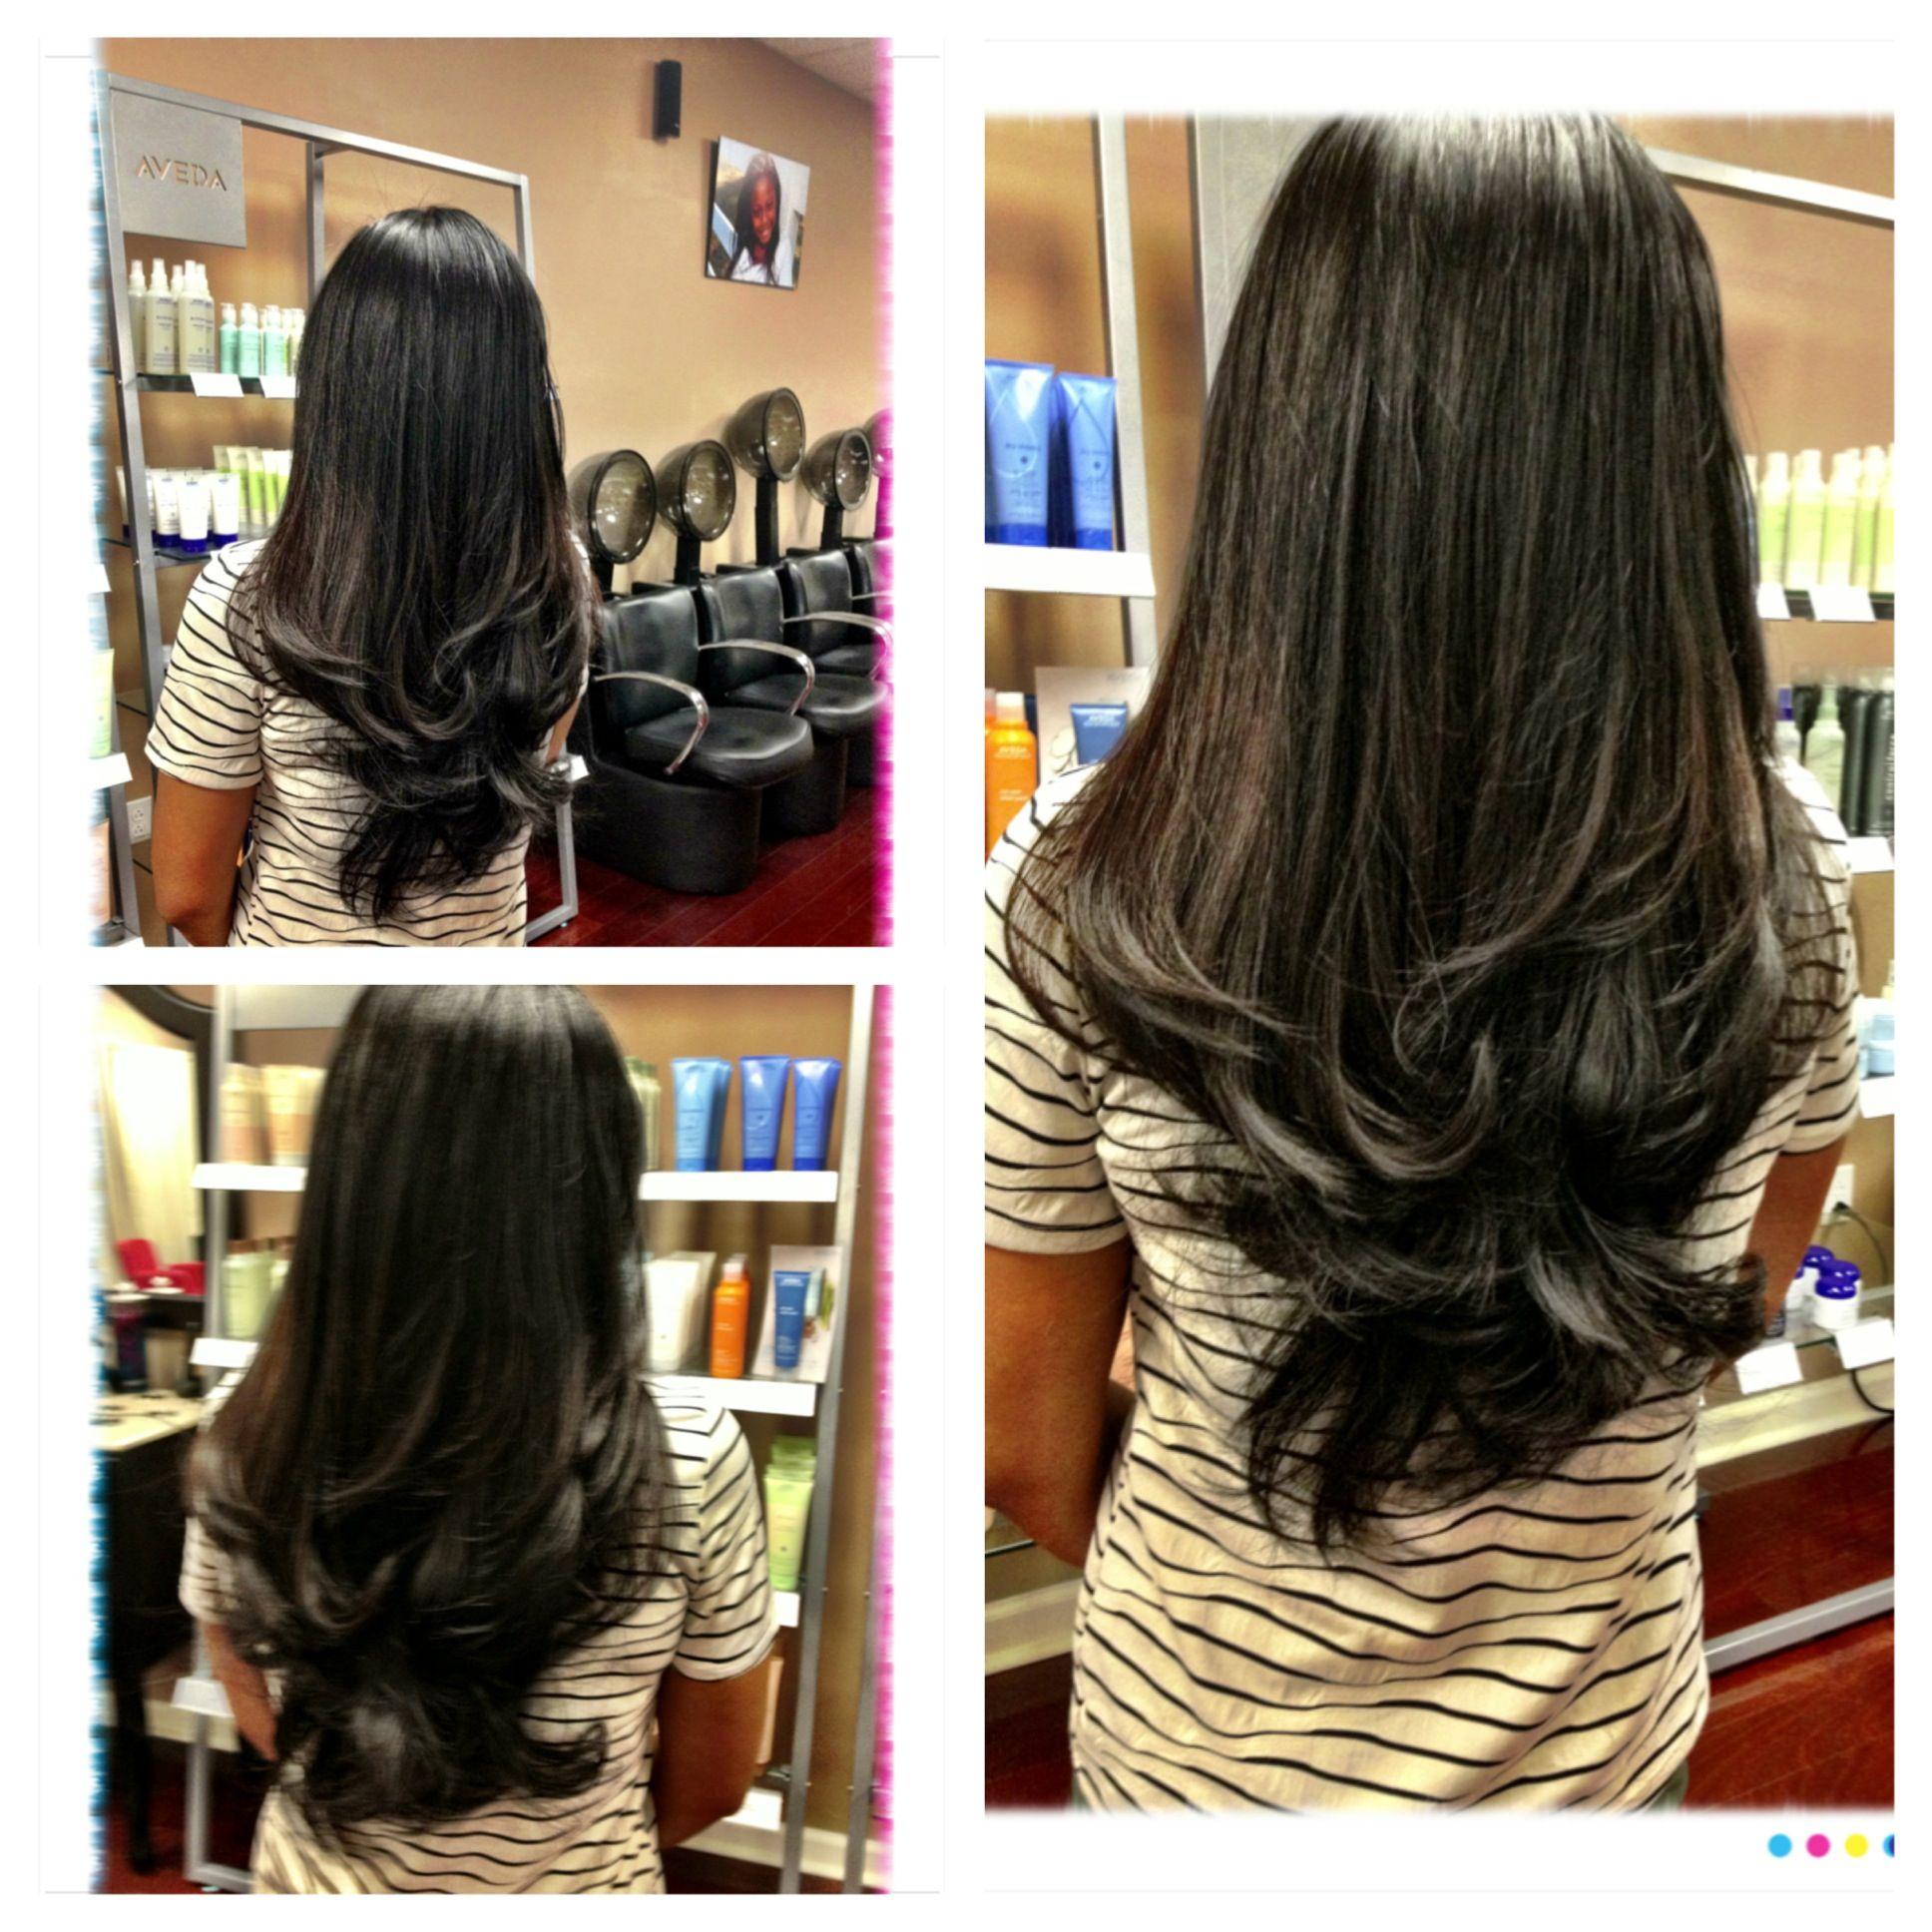 Aveda Dominicanhairsalon Dominicansalon Blowout Drybar Keratin Asha Dominican Blow Bar 618 Thorton Natural Hair Styles Natural Hair Blowout Latina Hair